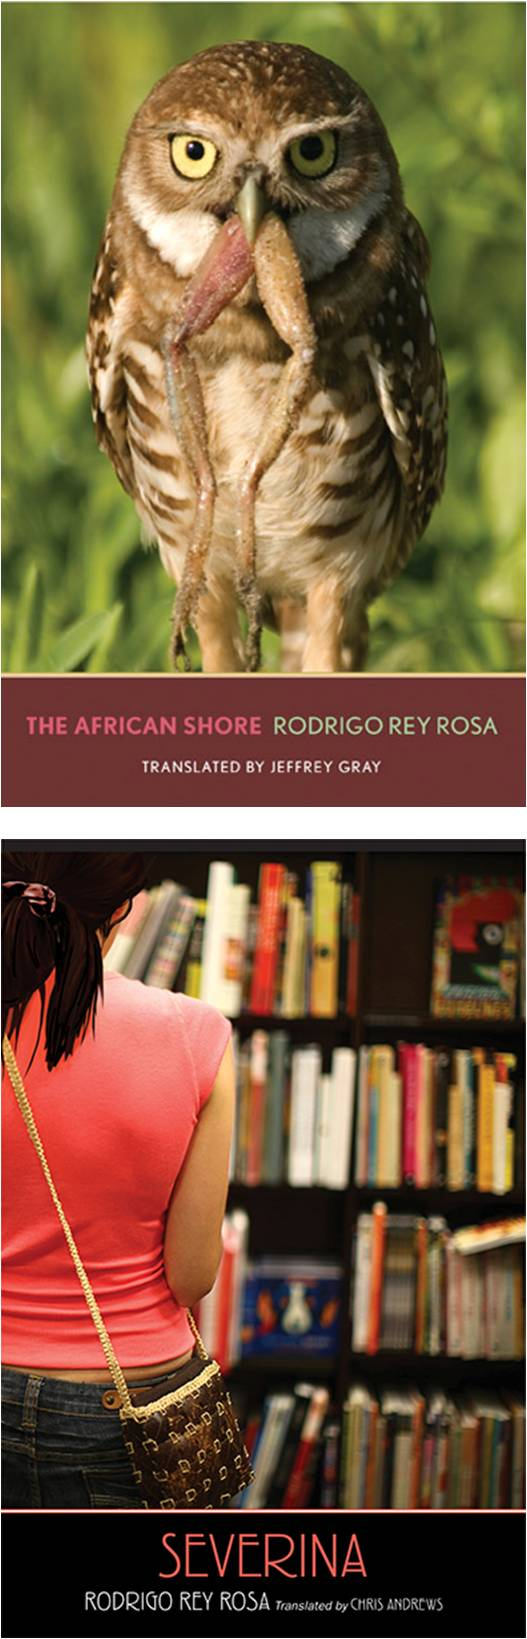 The African Shore    by  Rodrigo Rey Rosa    Translated by  Jeffrey Gray  (Yale University Press, 2013)     Severina    by  Rodrigo Rey Rosa  Translated by  Chris Andrews  (Yale University Press, 2014)    Reviewed by  Jennifer Kurdyla